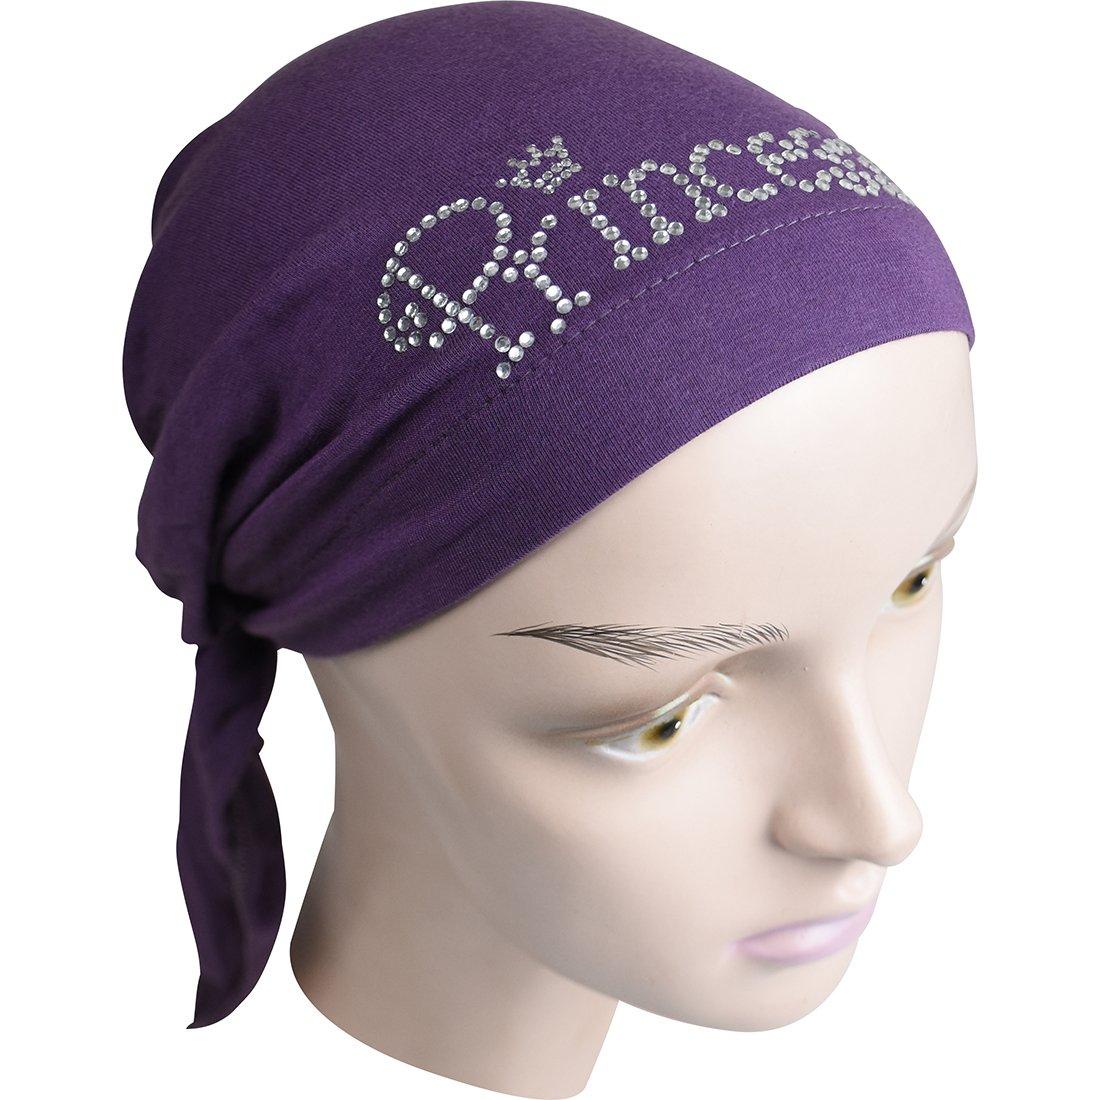 Princess Applique on Child's Pretied Head Scarf Cancer Cap Purple by Landana Headscarves (Image #2)